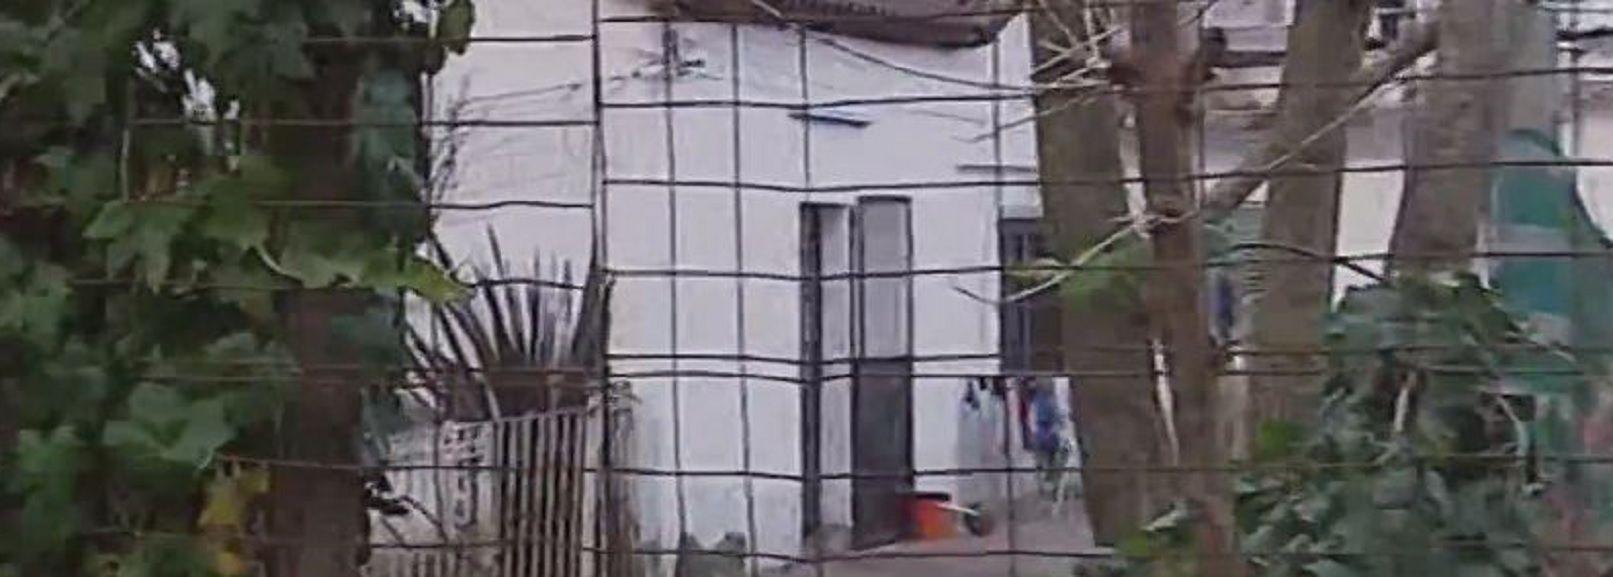 Acribillaron a tres personas en un presunto ajuste narco en Moreno